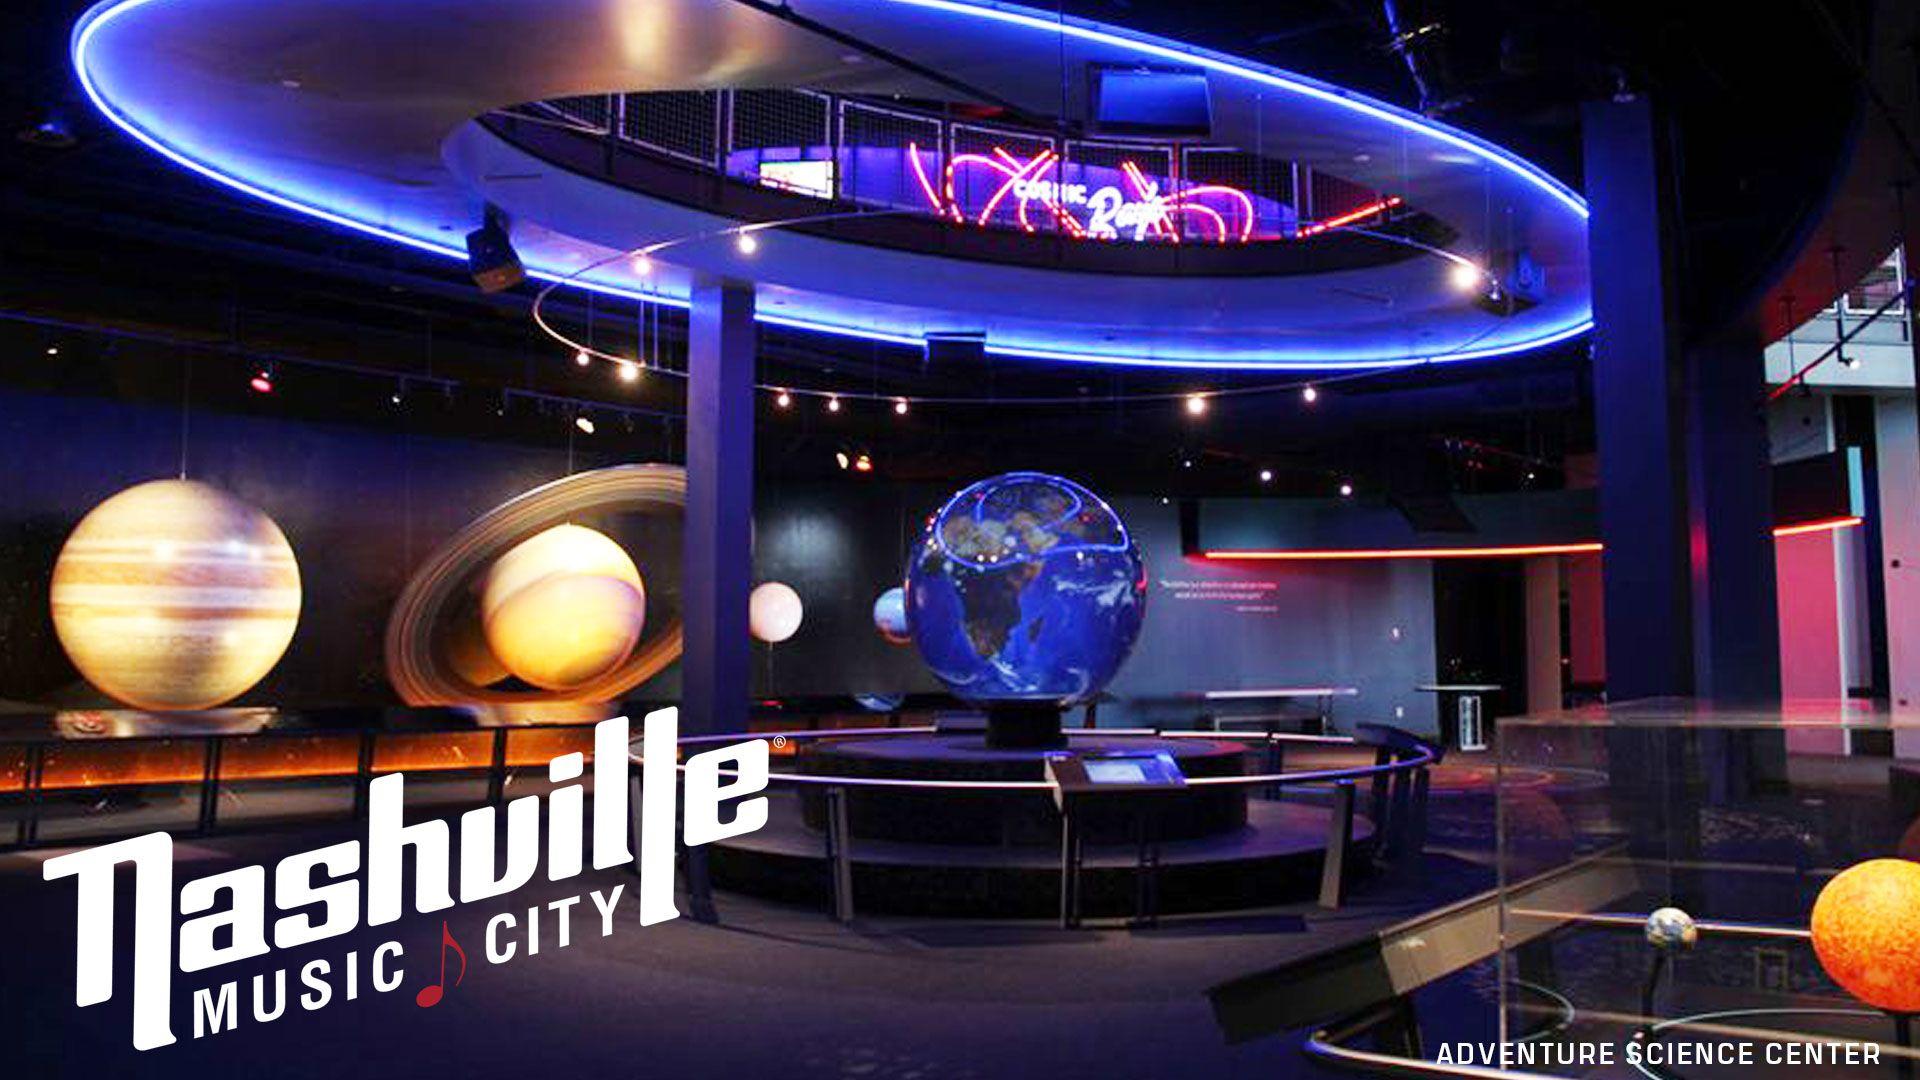 Nashville Virtual Attractions